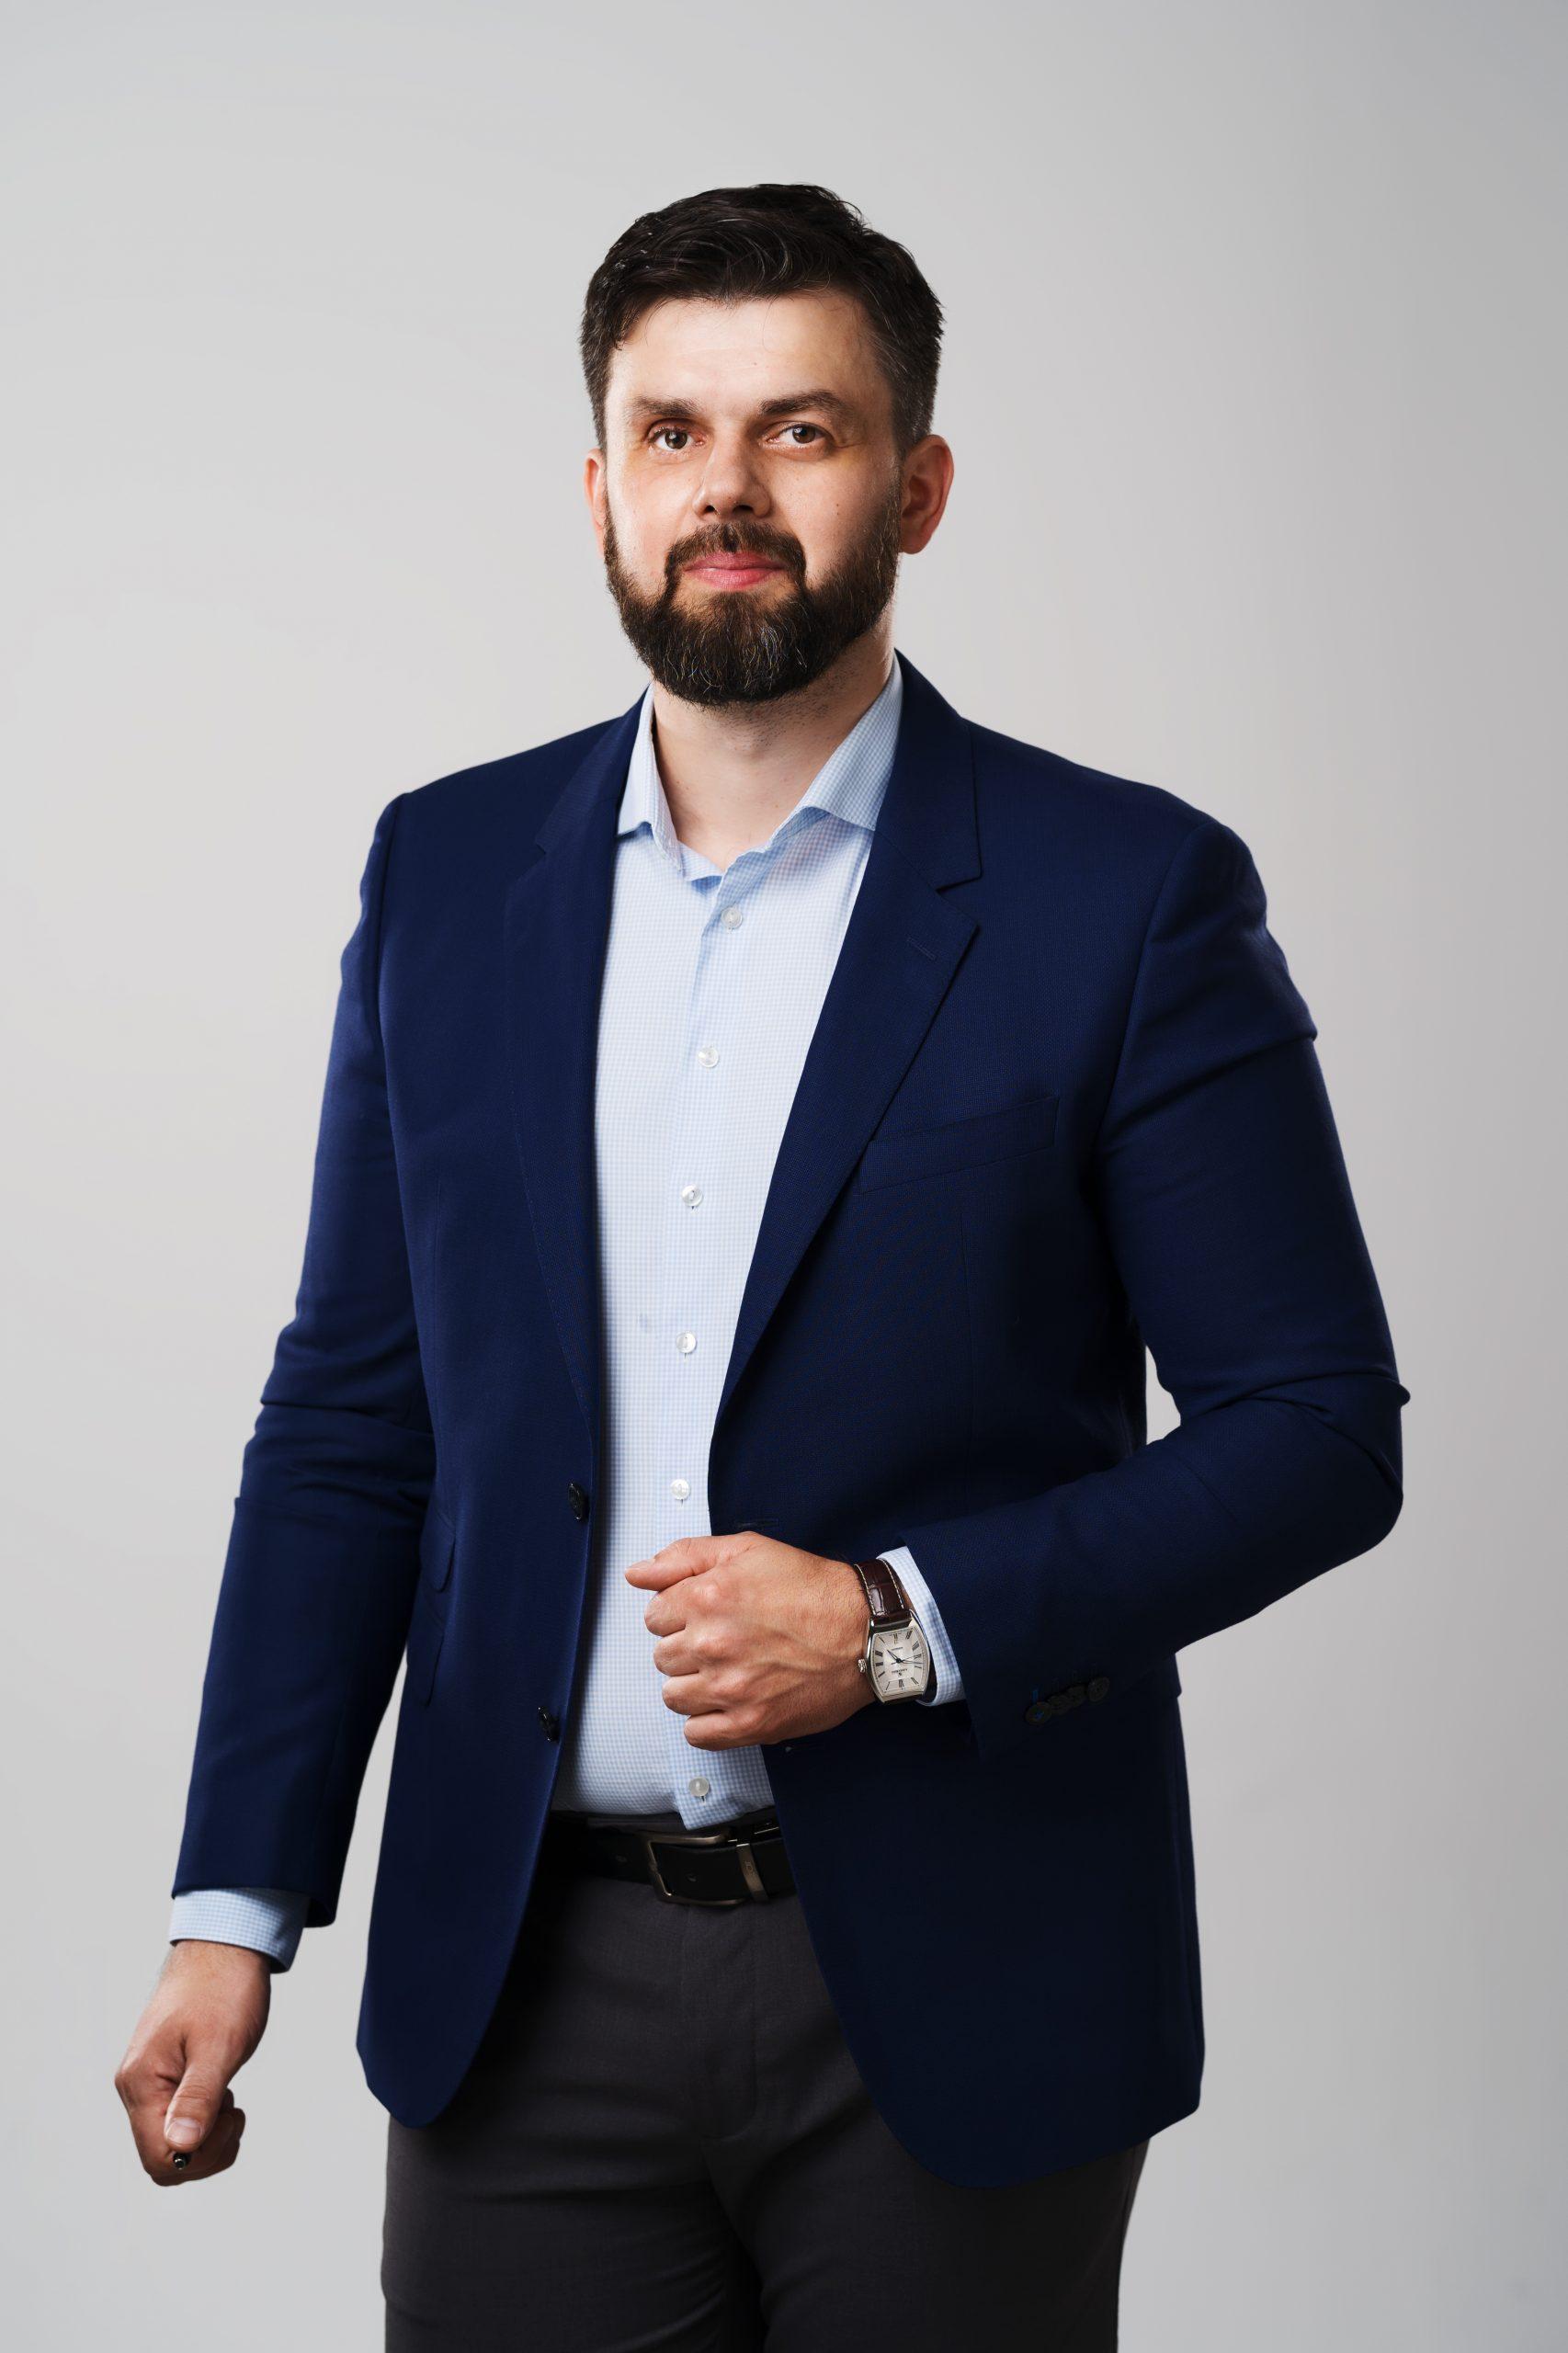 Piotr Maziakowski